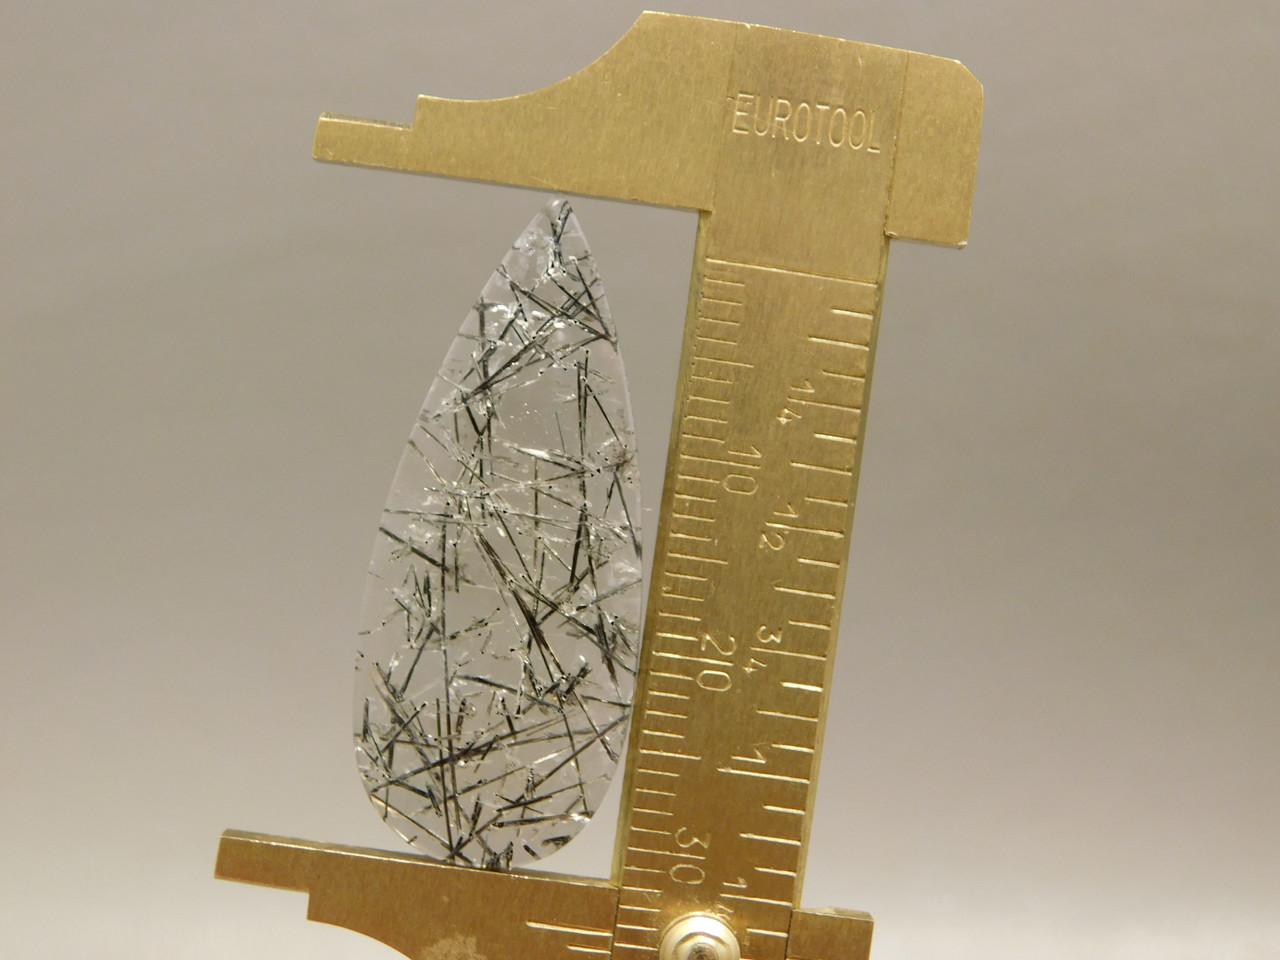 Tourmaline Quartz Cabochon Pear Shaped Stone Crystal #13